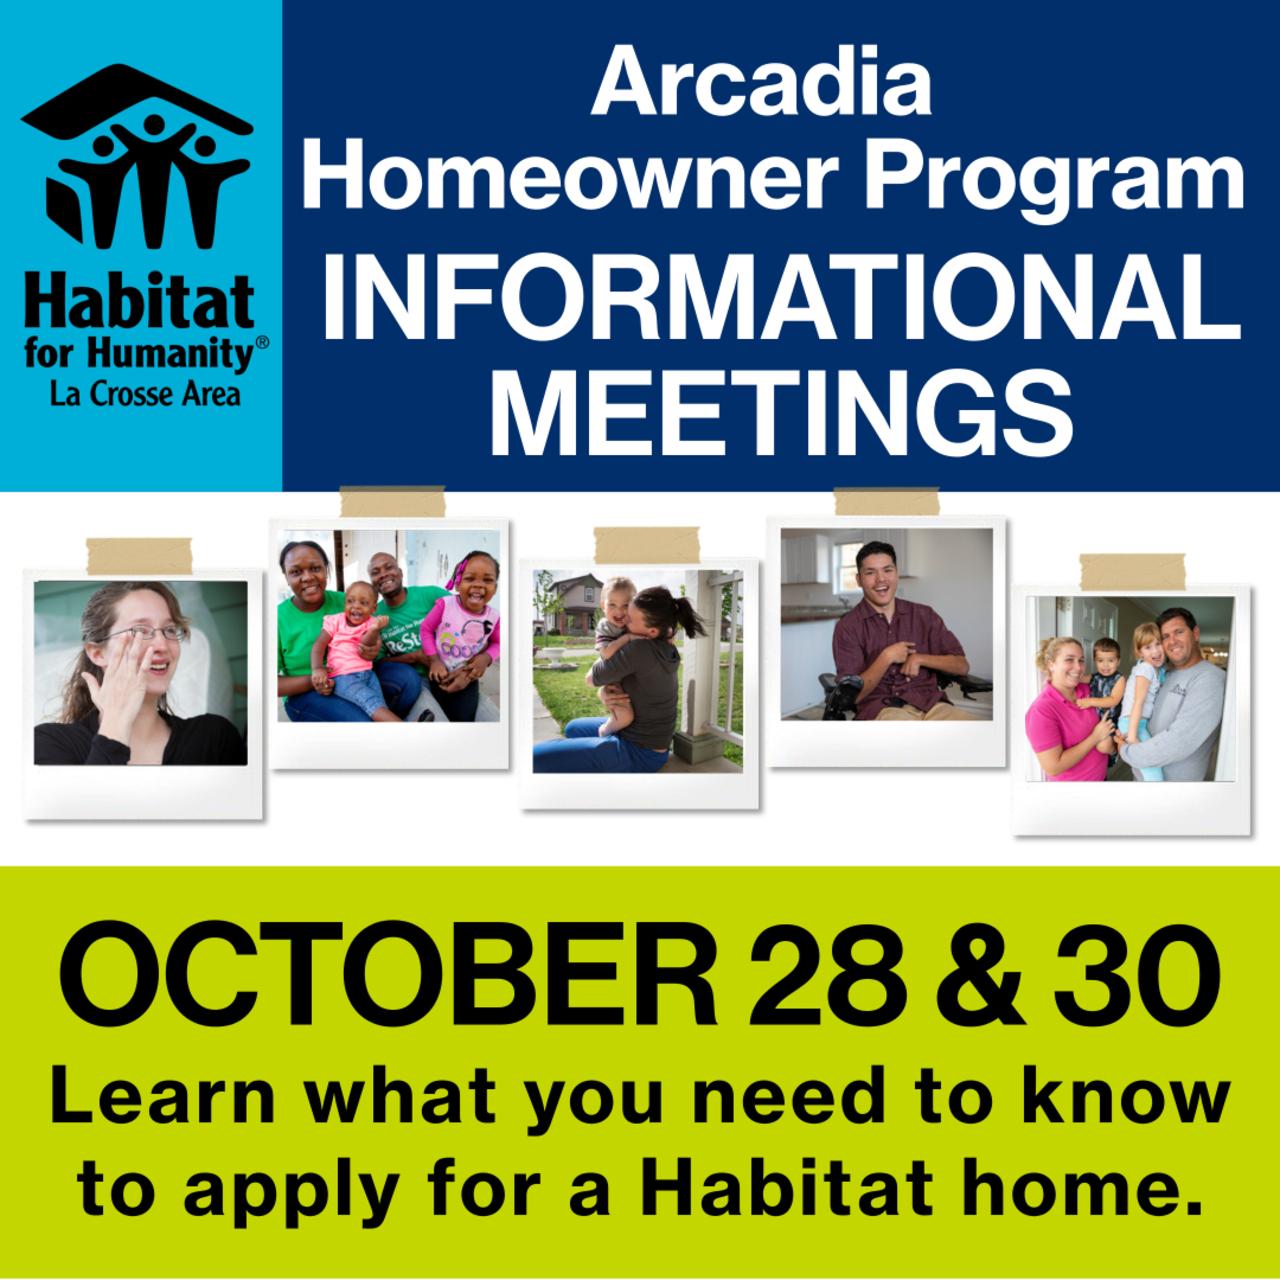 Arcadia Homeowner Program Informational Meeting